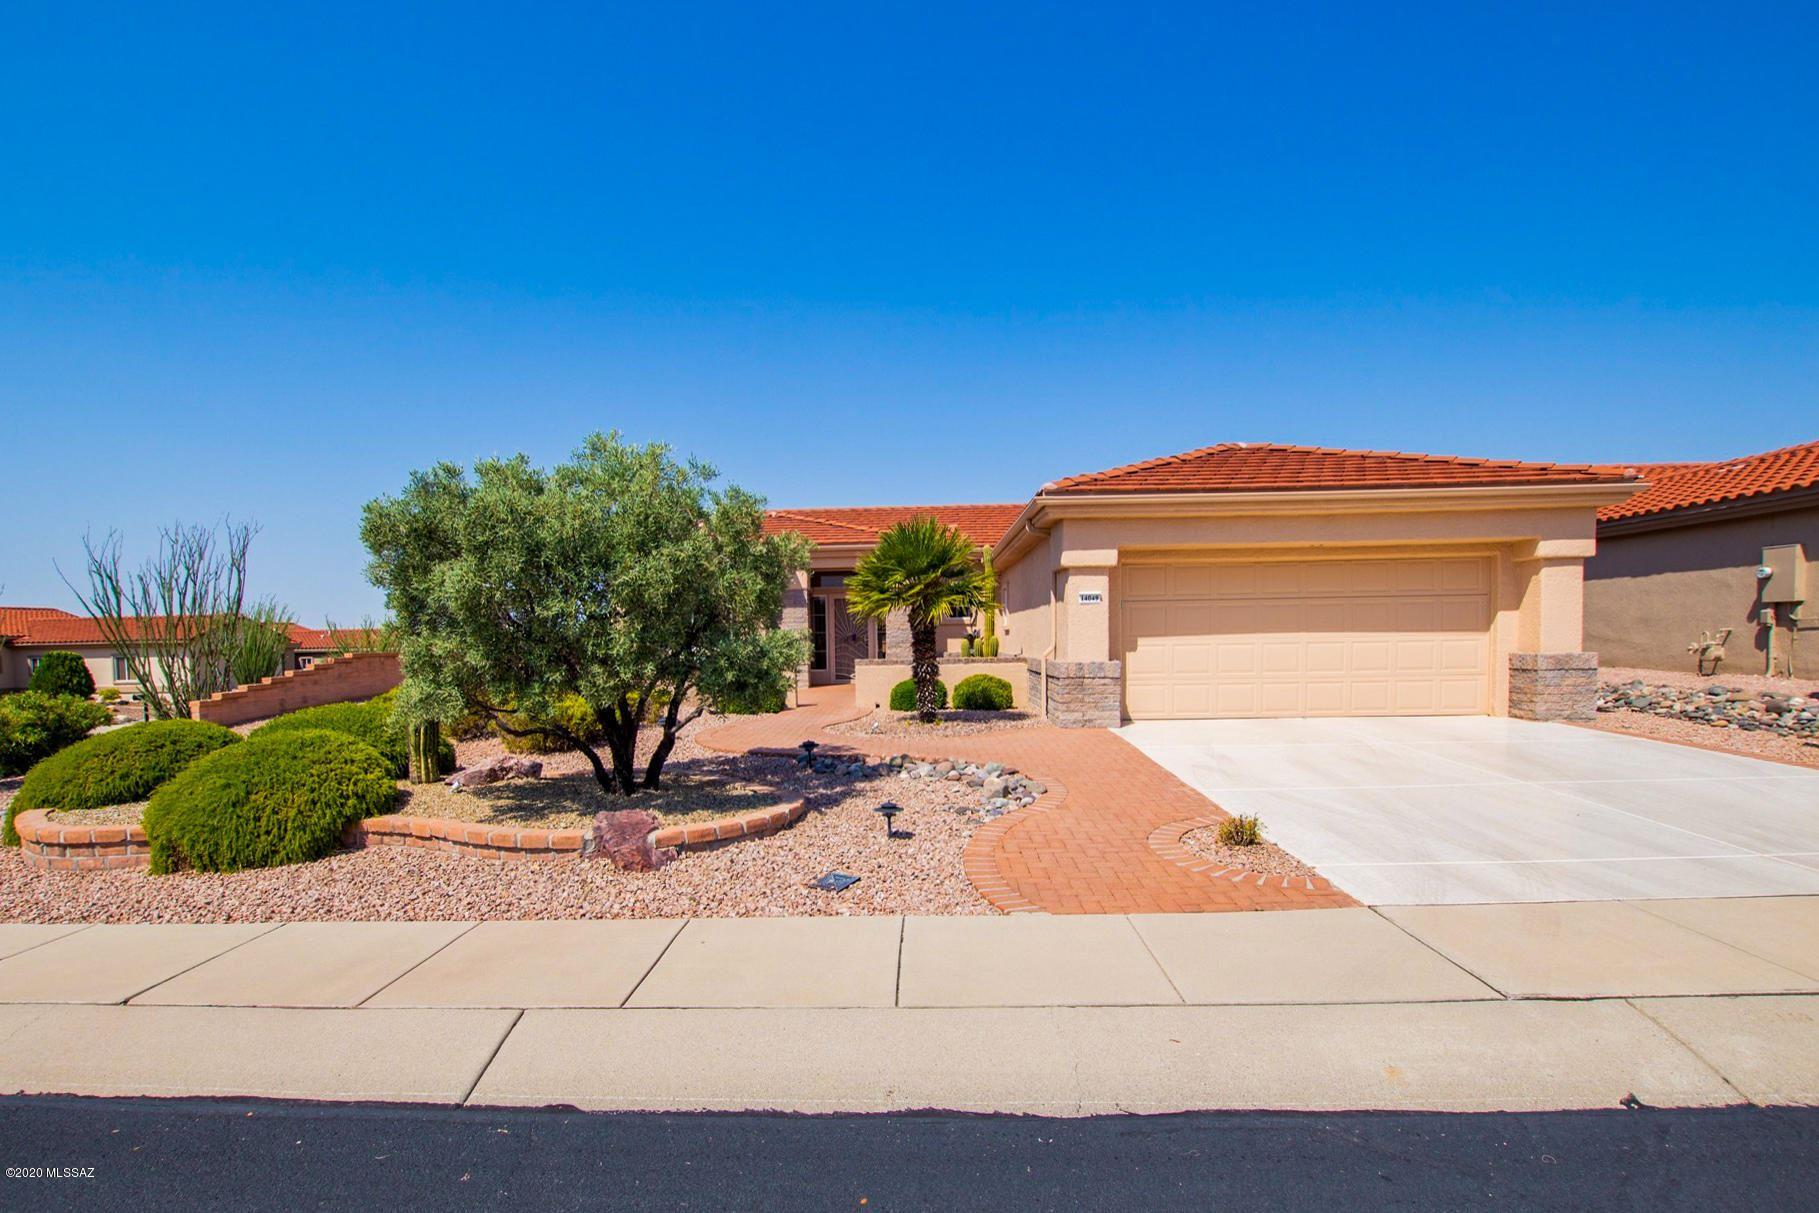 14049 N Buckingham Drive, Oro Valley, AZ 85755 - #: 22020796